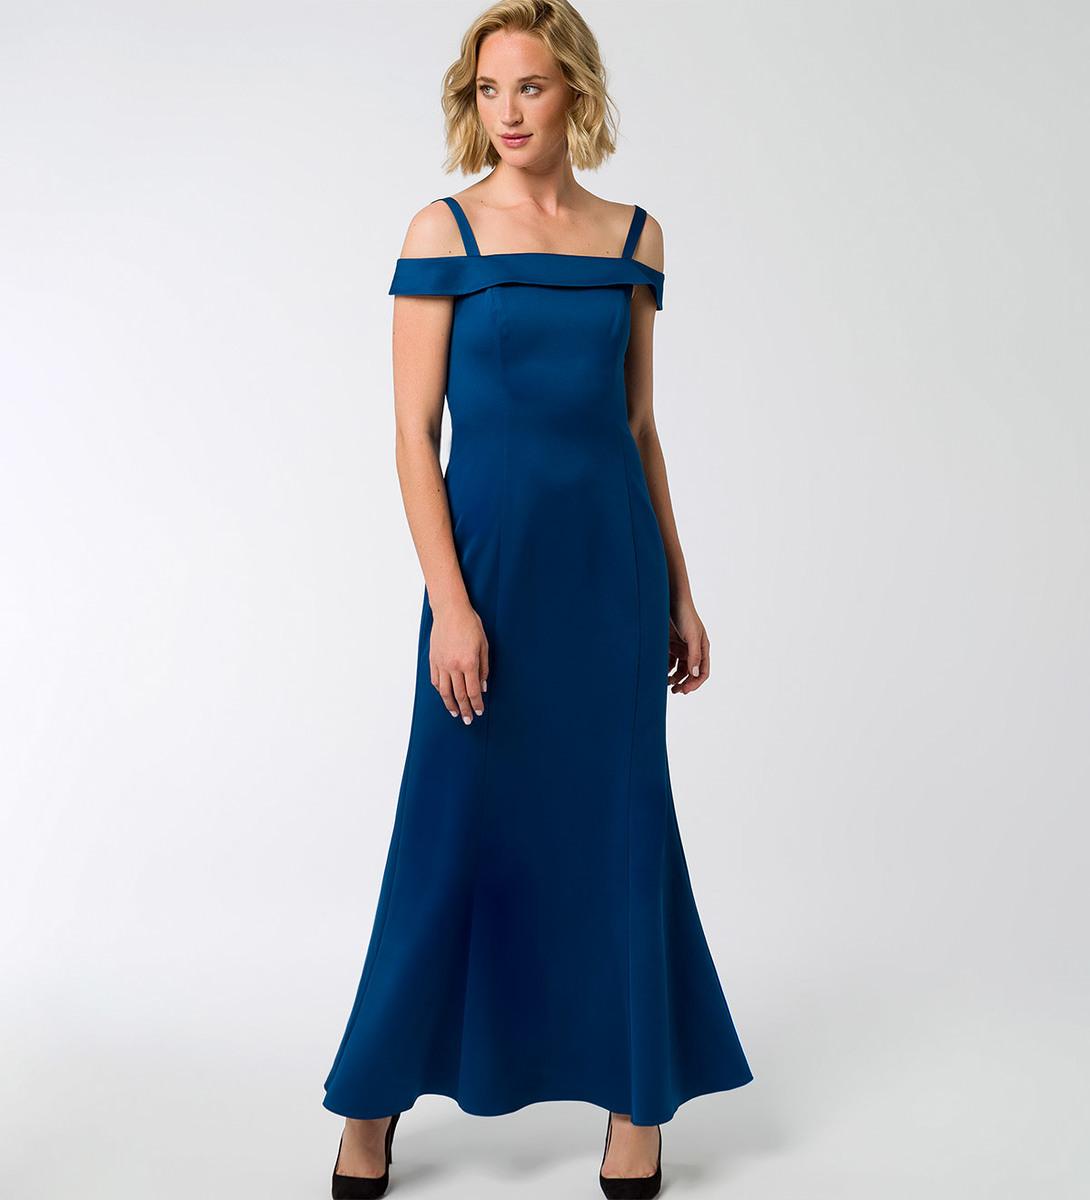 Kleider carmen ausschnitt elegant